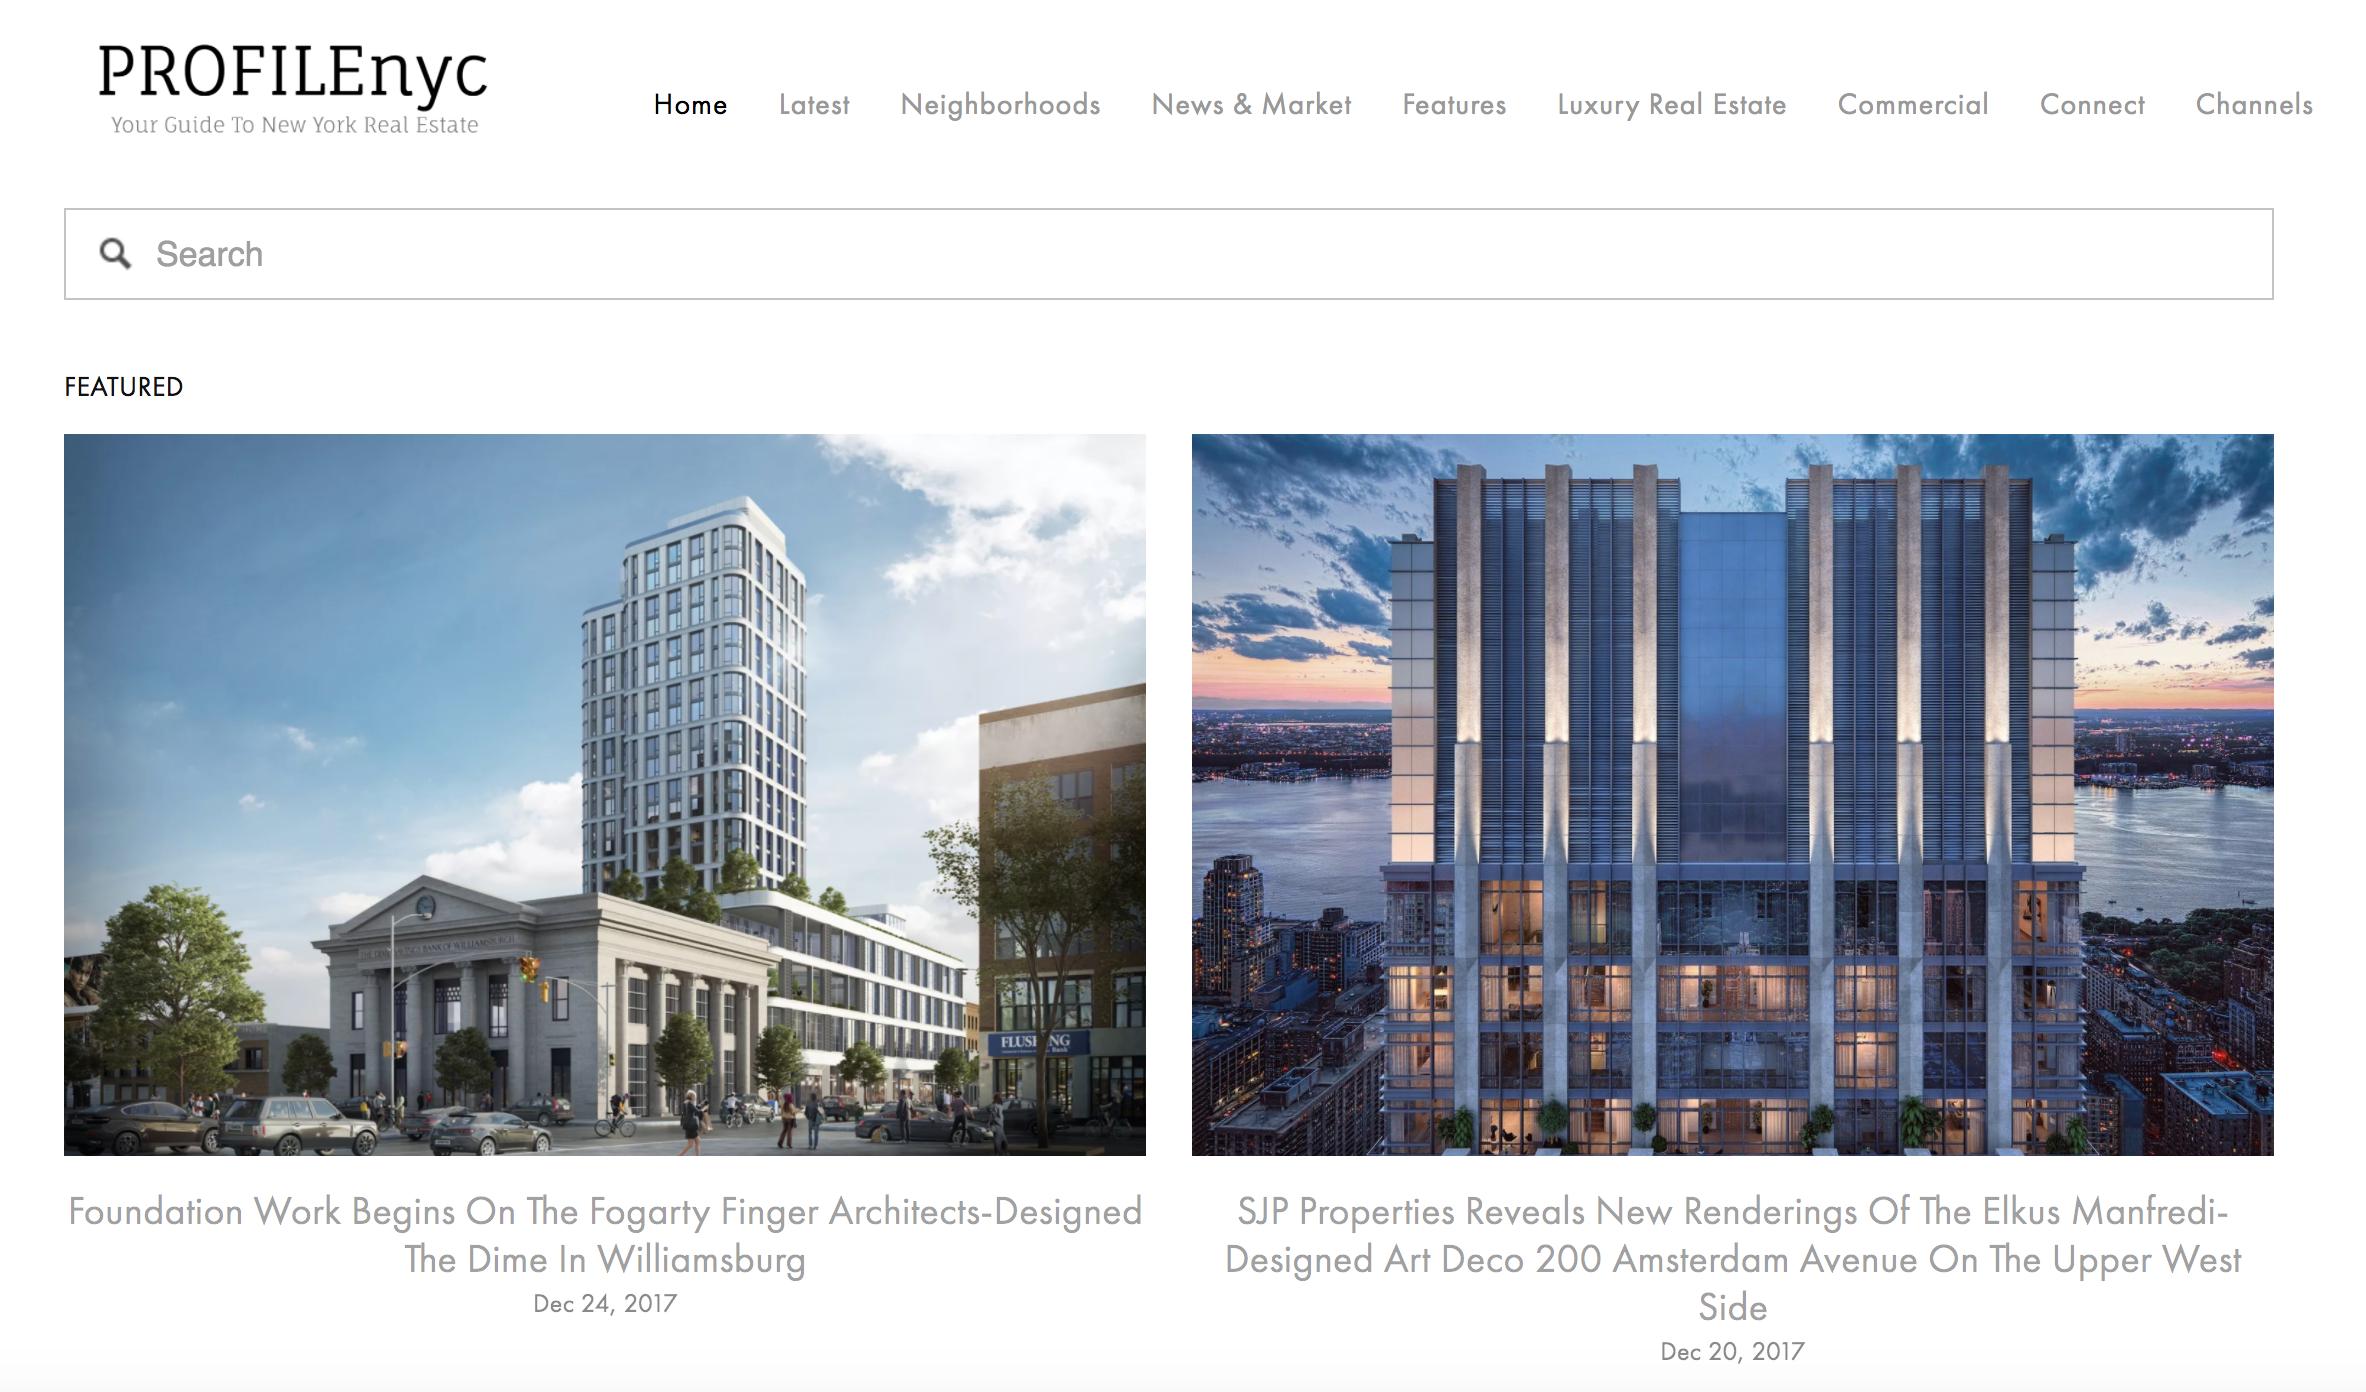 PROFILEnyc New York Real Estate News